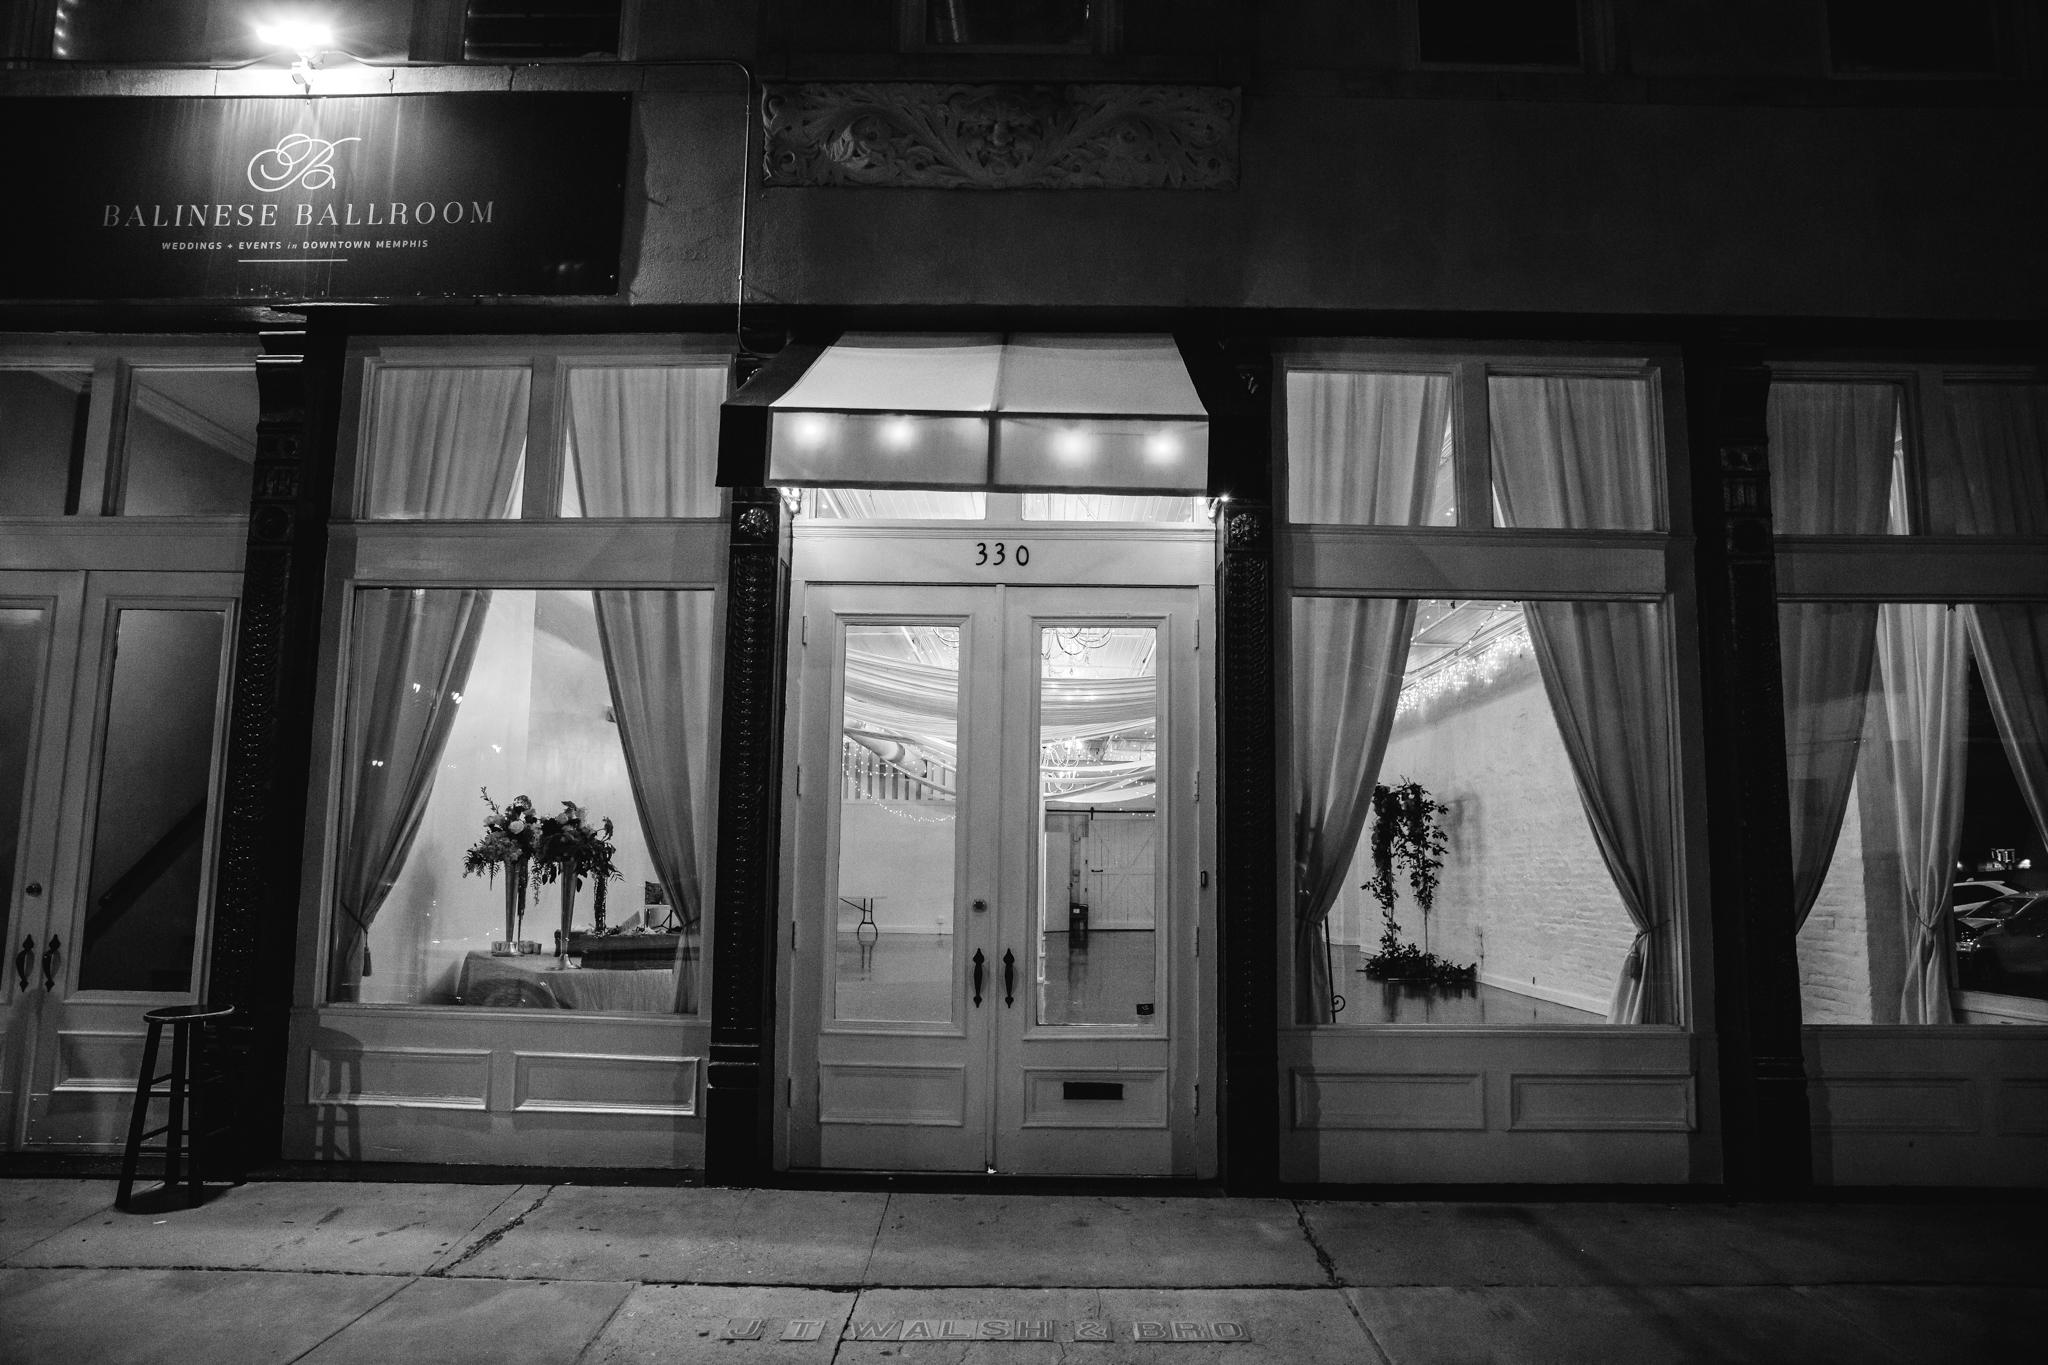 memphis-wedding-photographers-thewarmtharoundyou-ballinese-ballroom (217 of 232).jpg